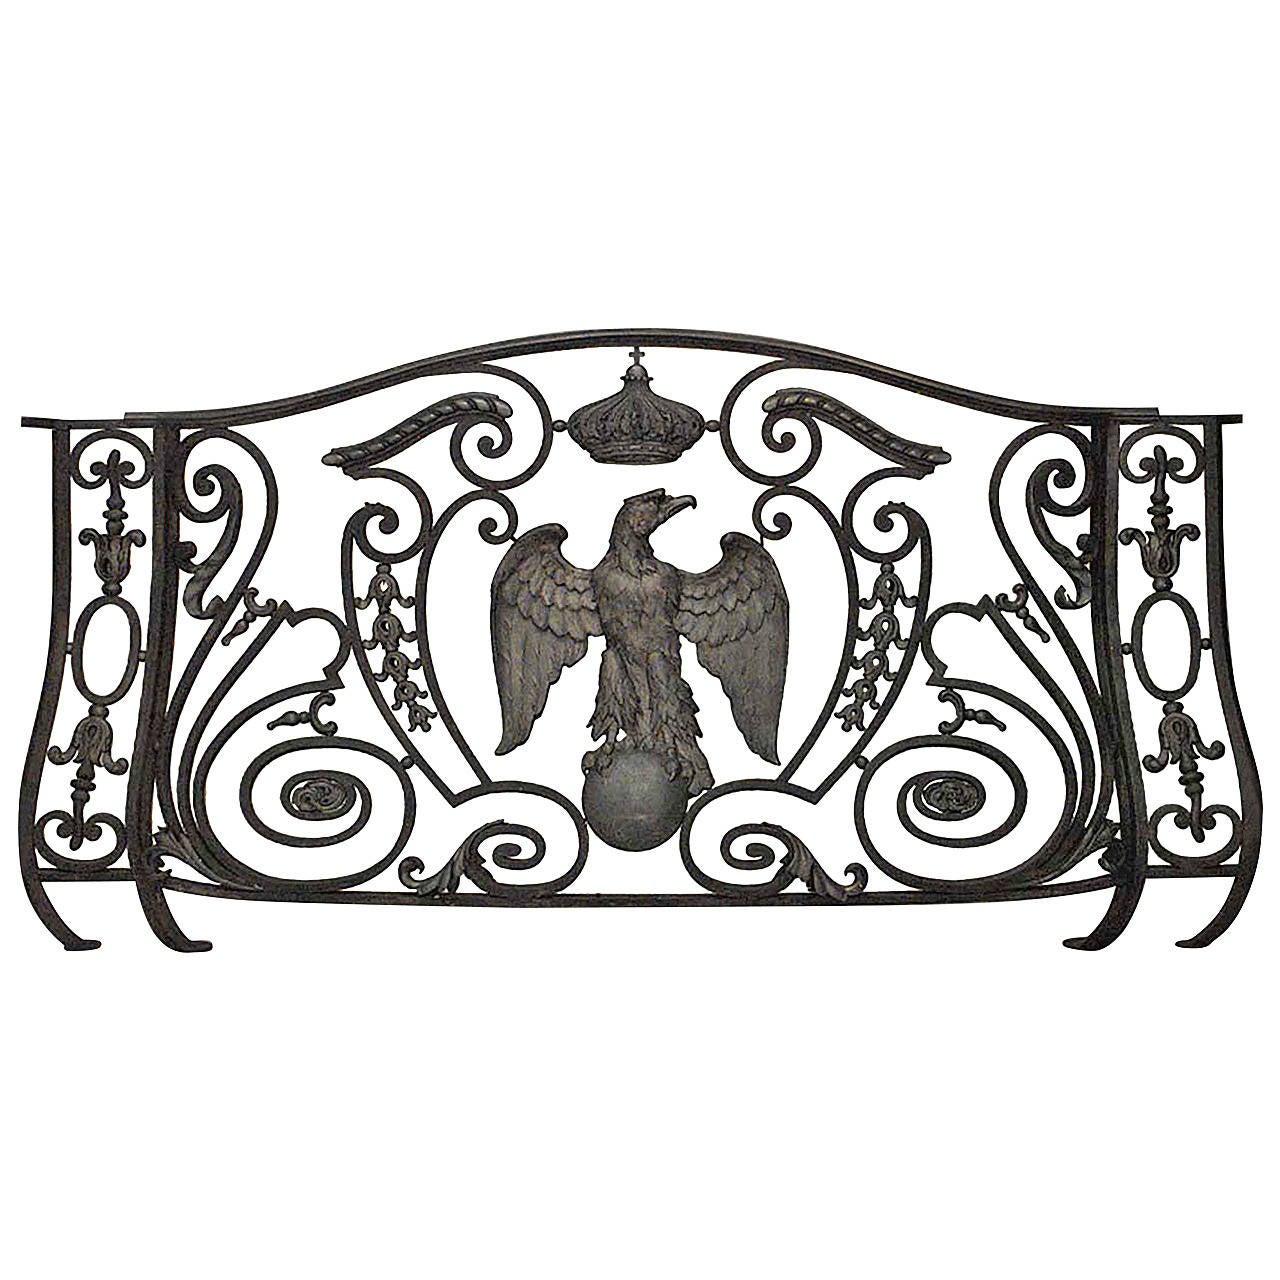 A Sensational Cast Iron Balcony Railing From France C 1875